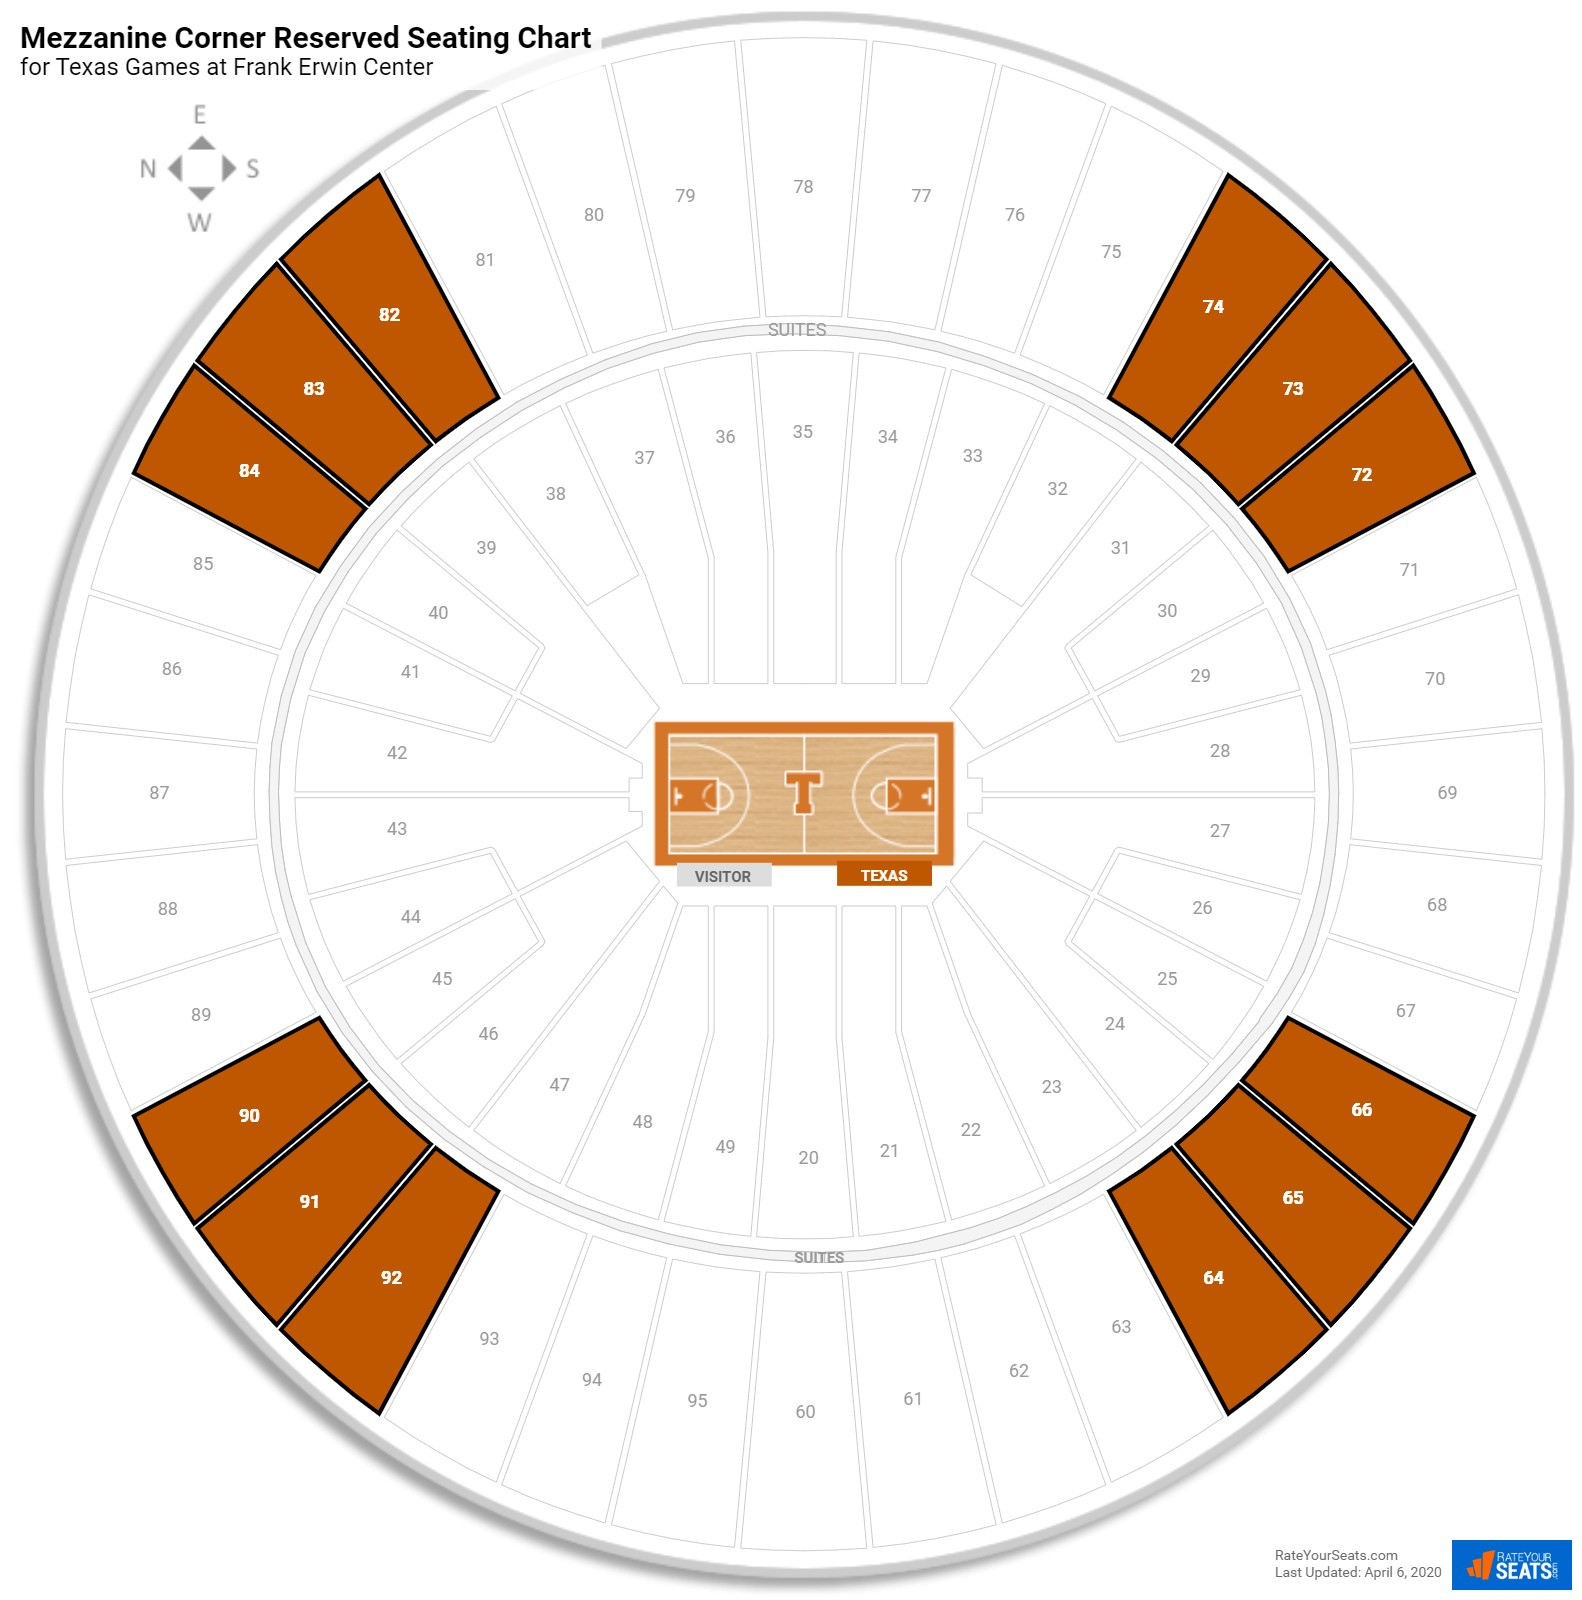 Frank Erwin Center Mezzanine Corner Reserved Seating Chart